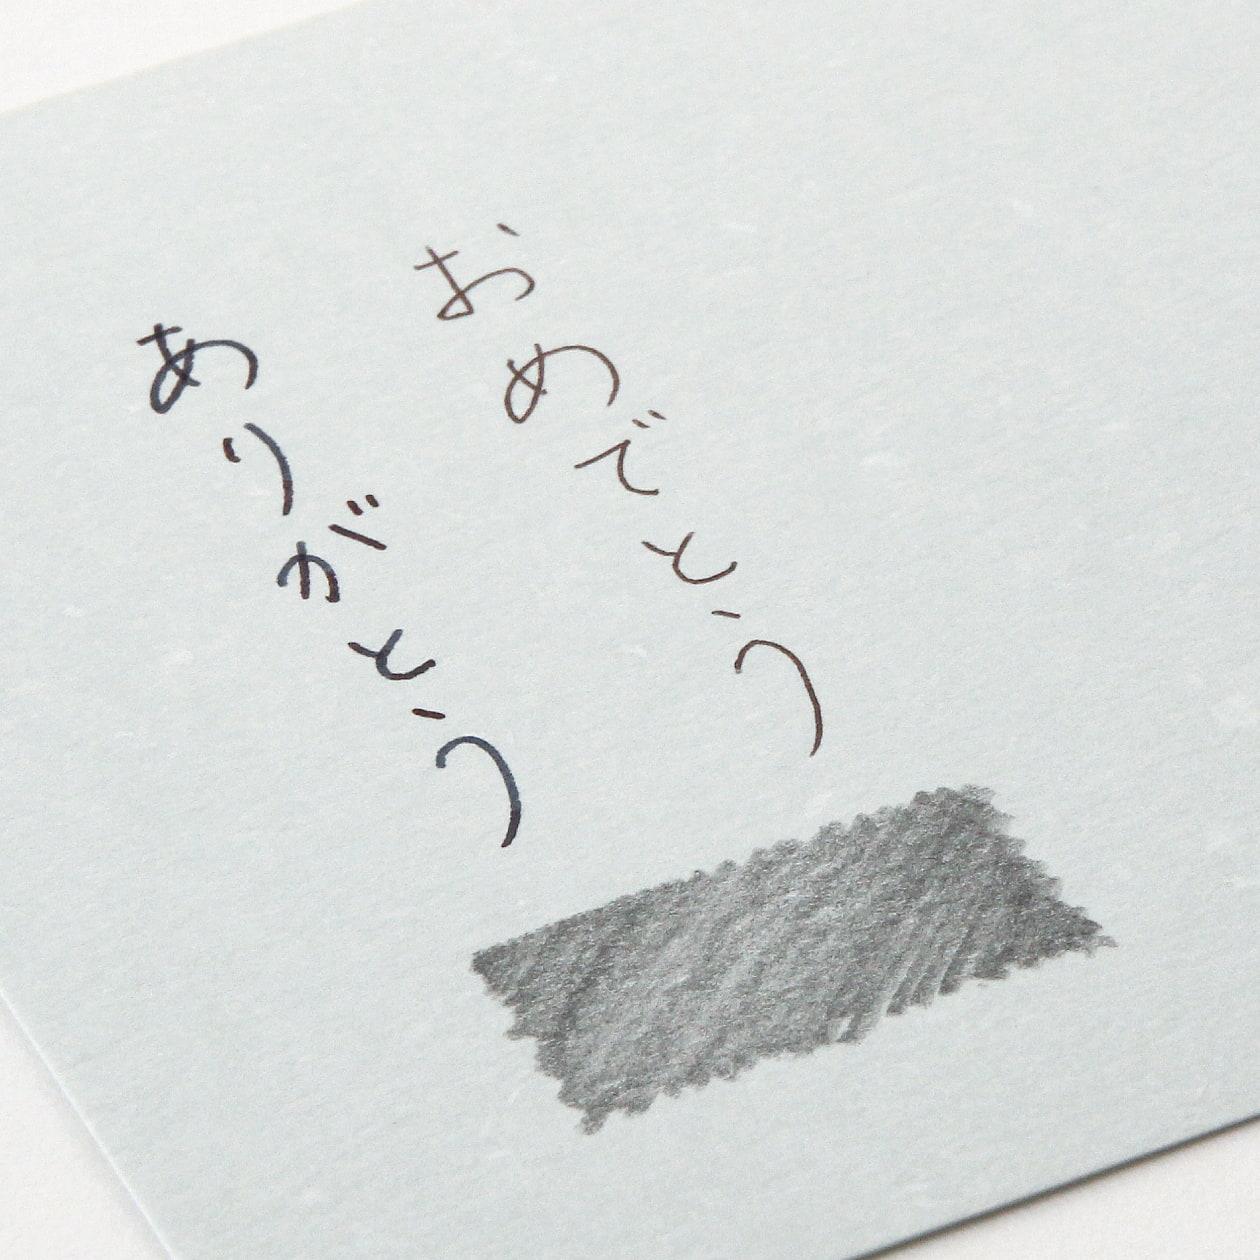 #53VカードR フェザーワルツ ミズ 197.7g